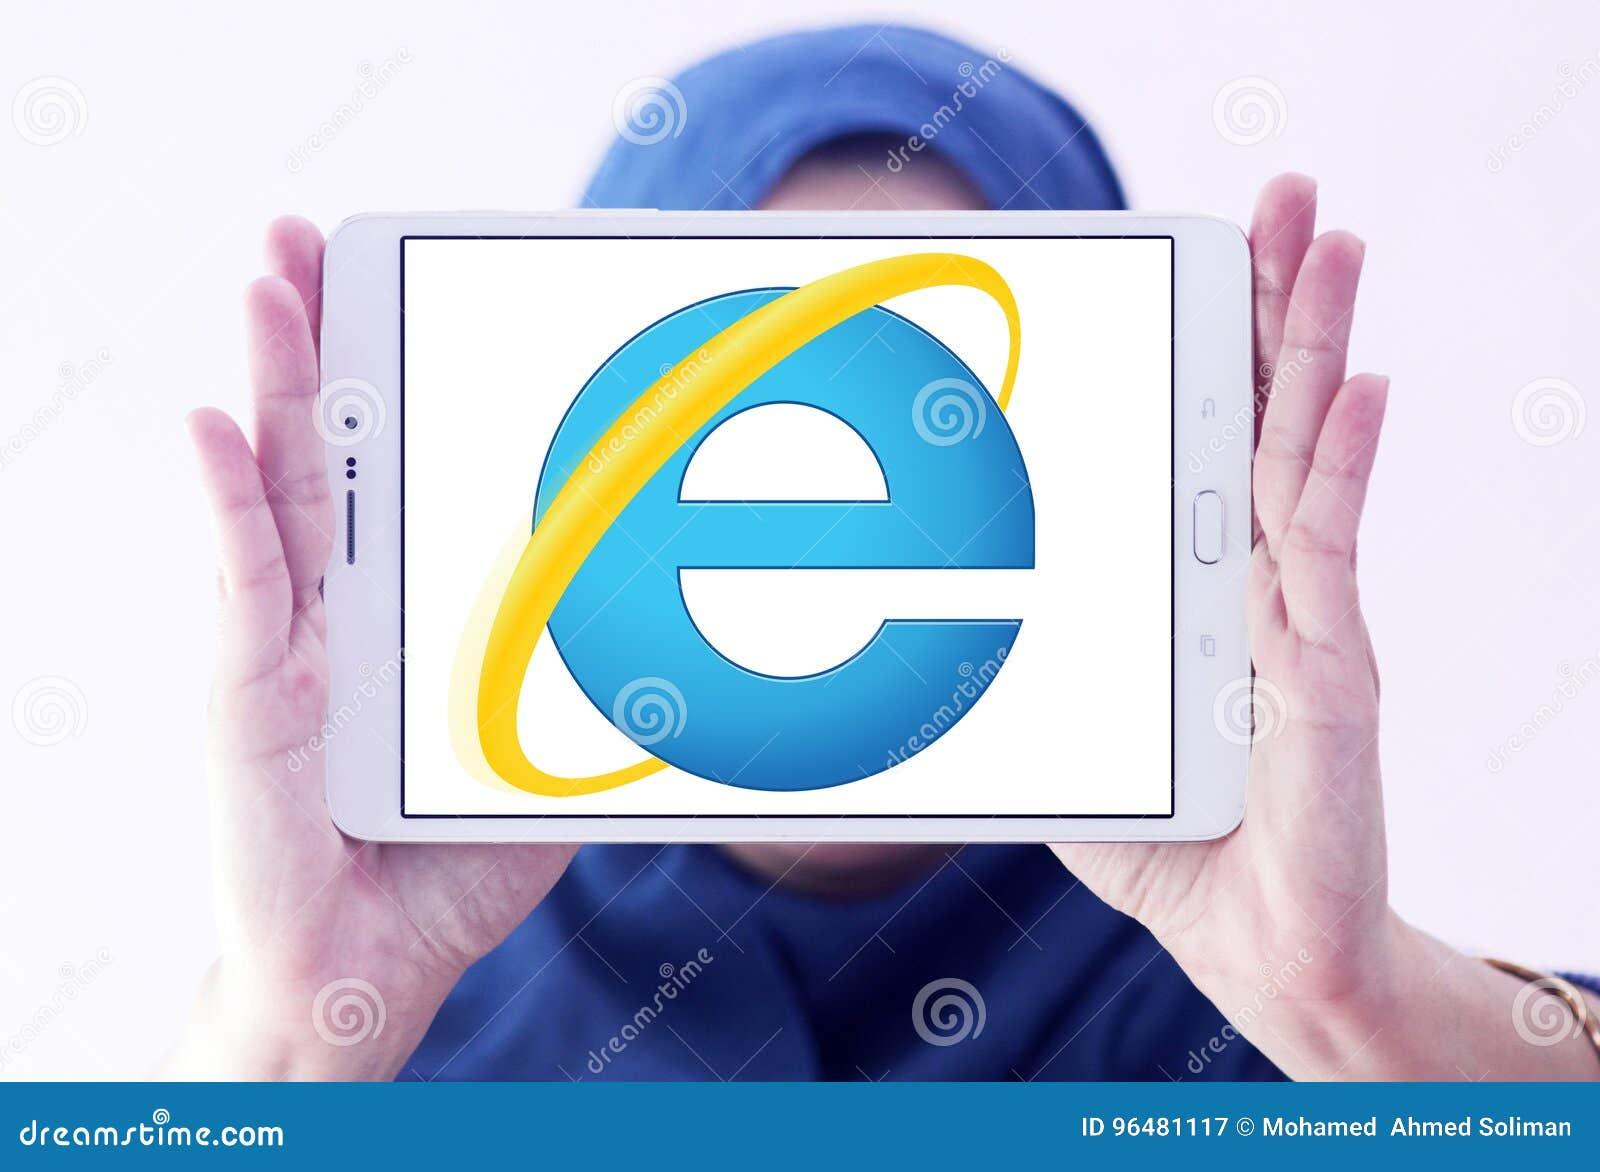 Internet explorer web browser logo editorial stock photo image.